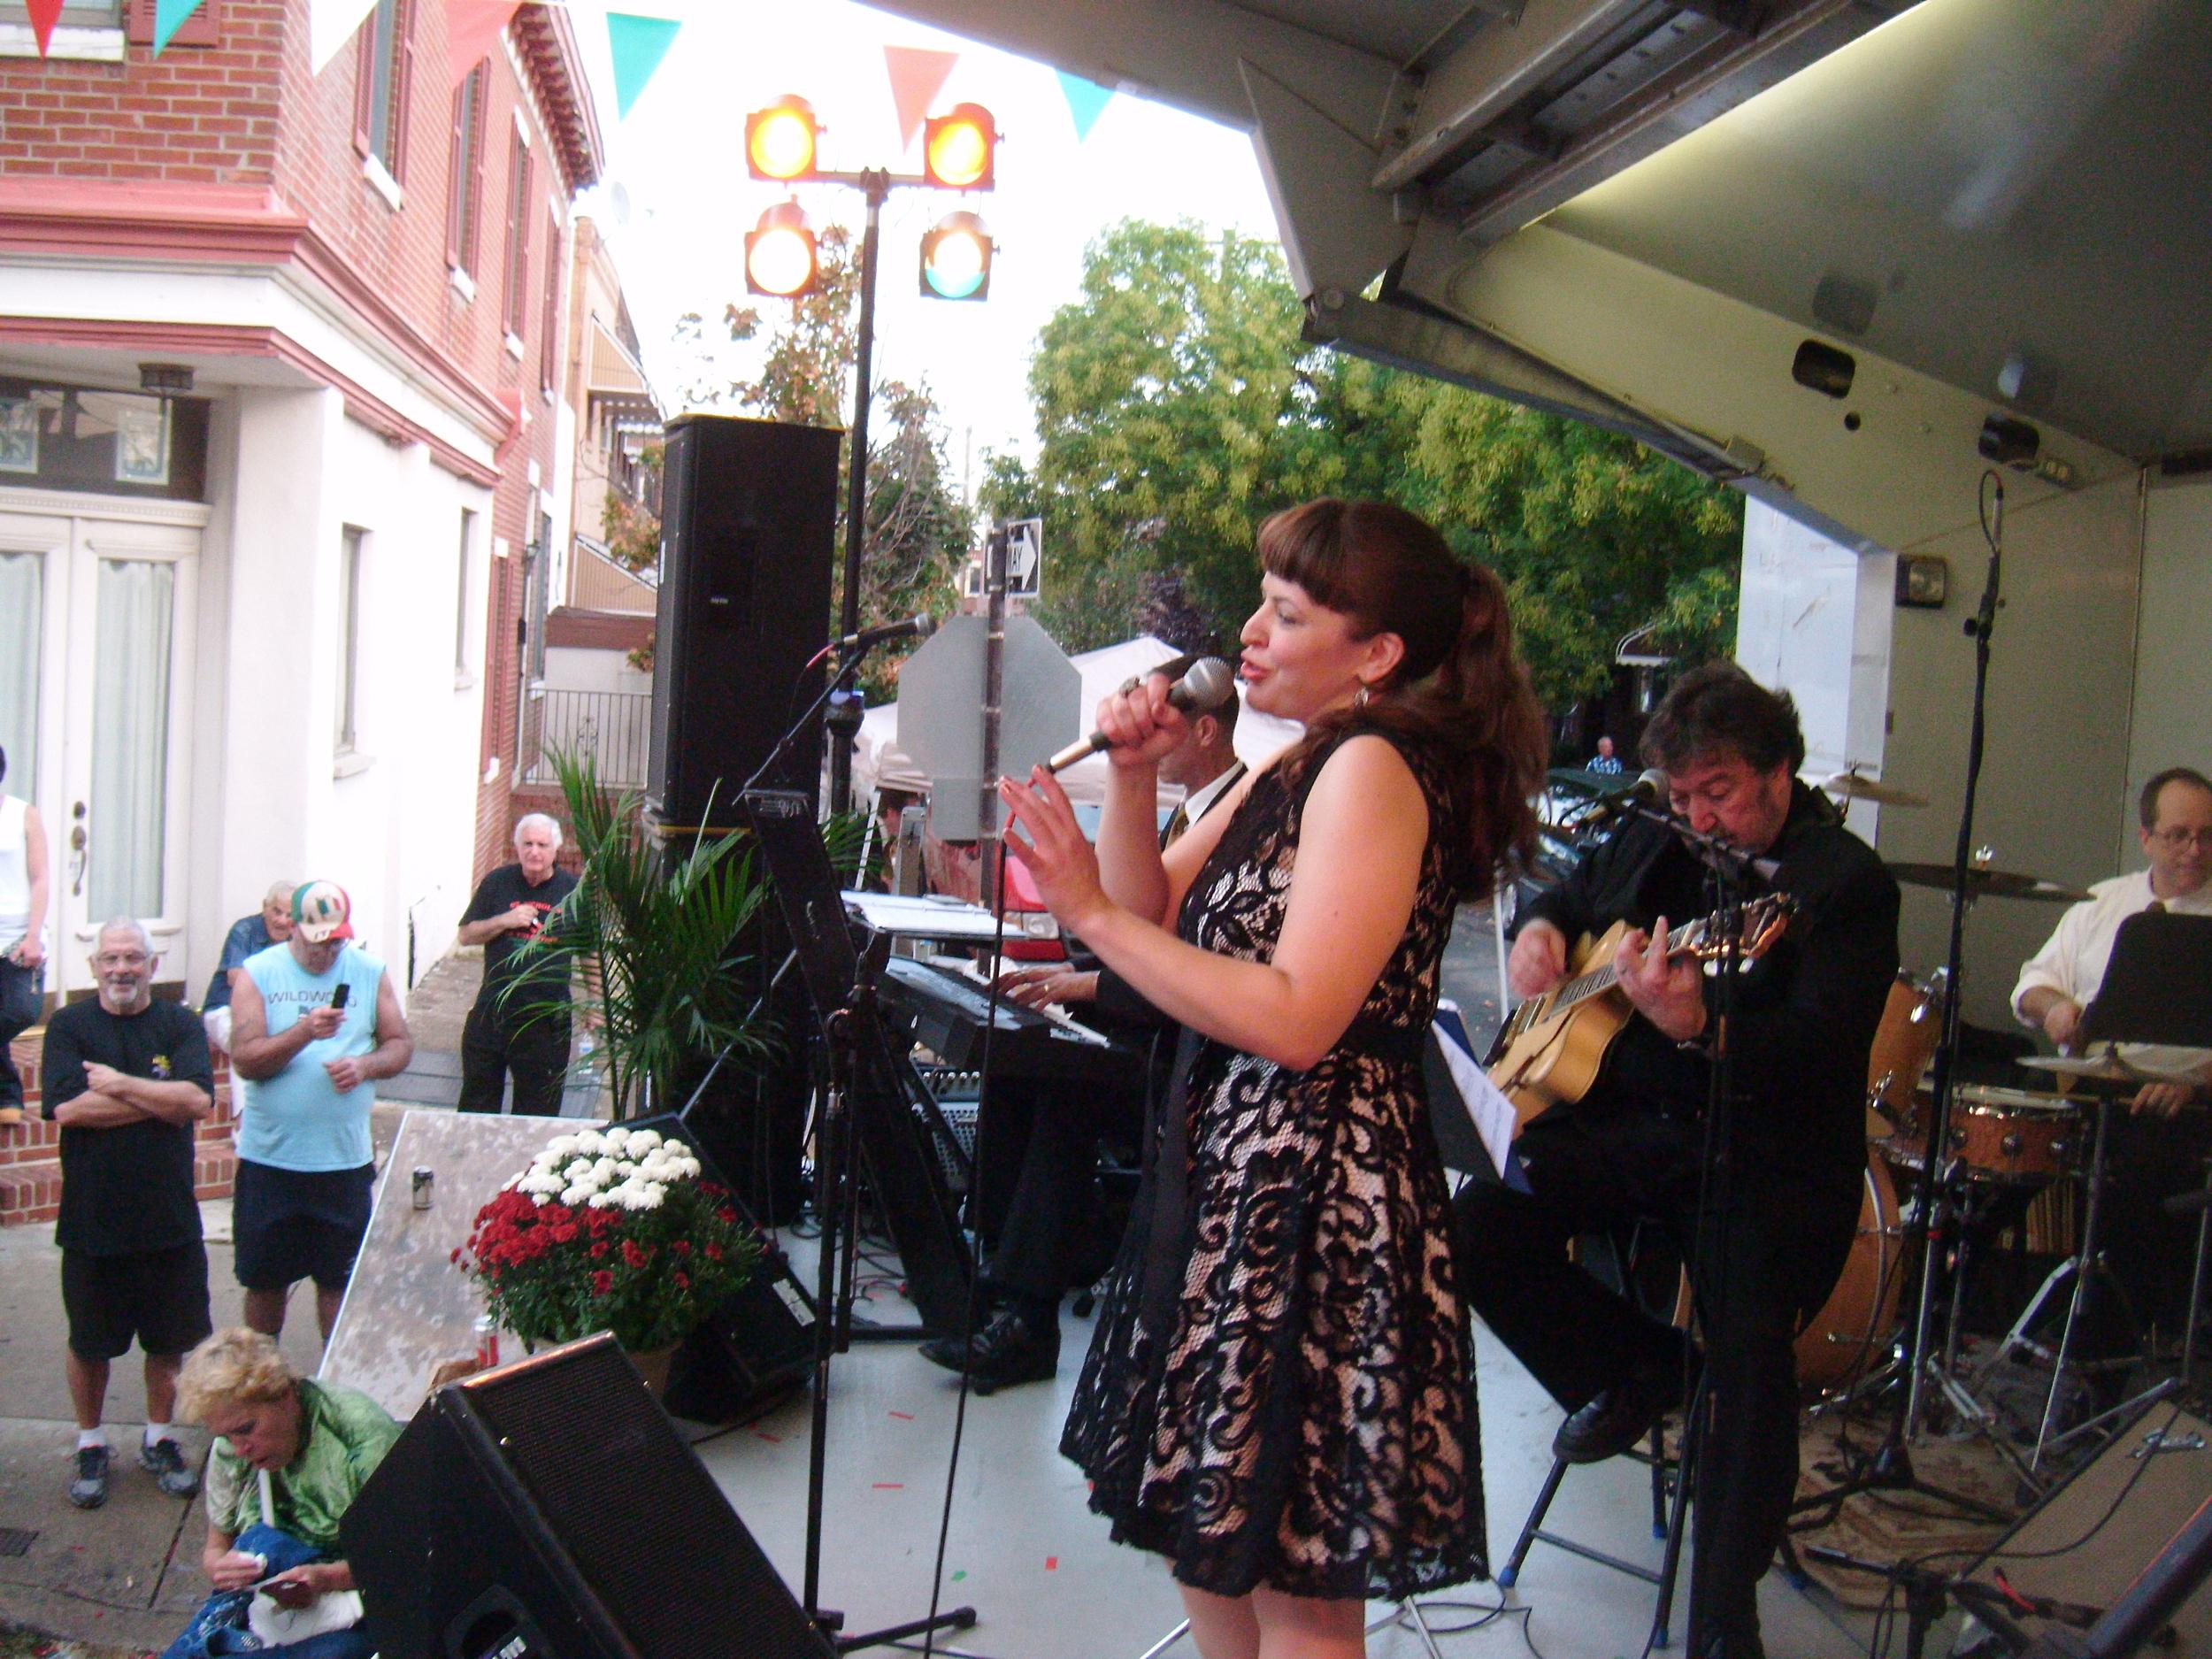 Copy of Jenna Esposito at St. Nicholas Festival